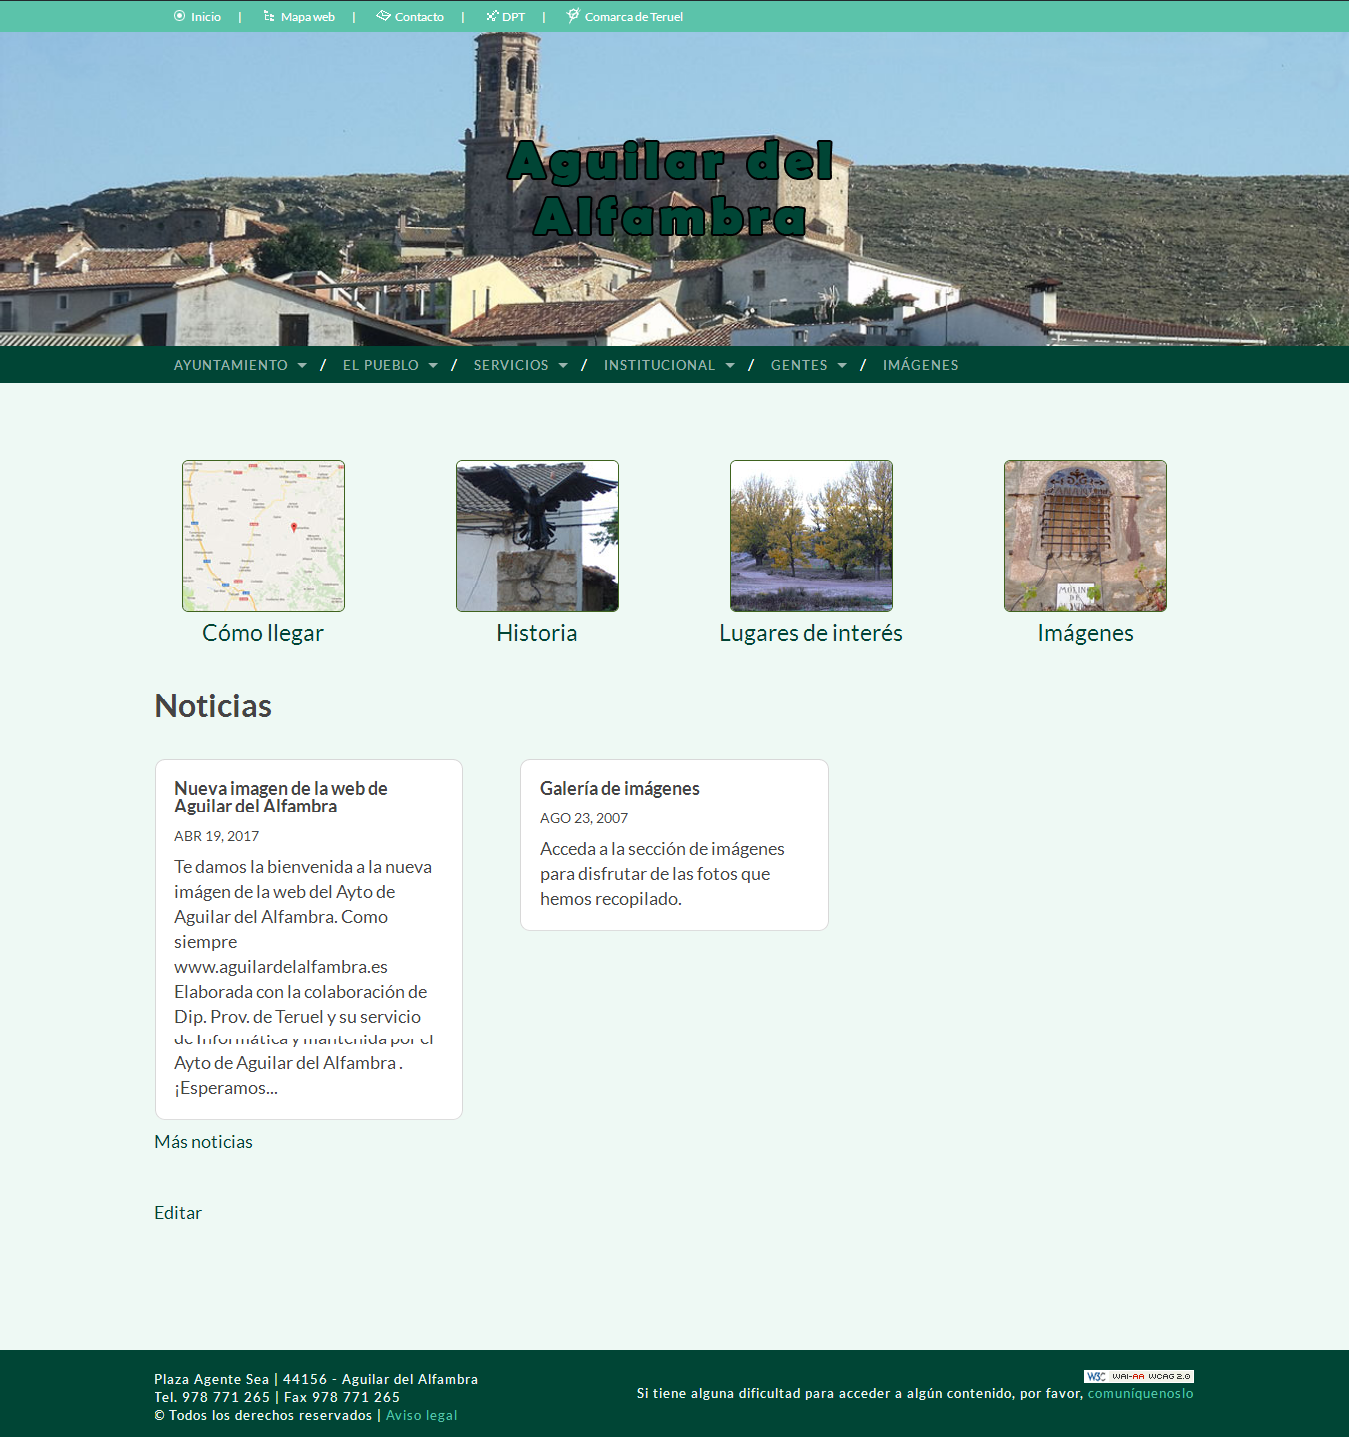 Nueva imagen de la web de Aguilar del Alfambra